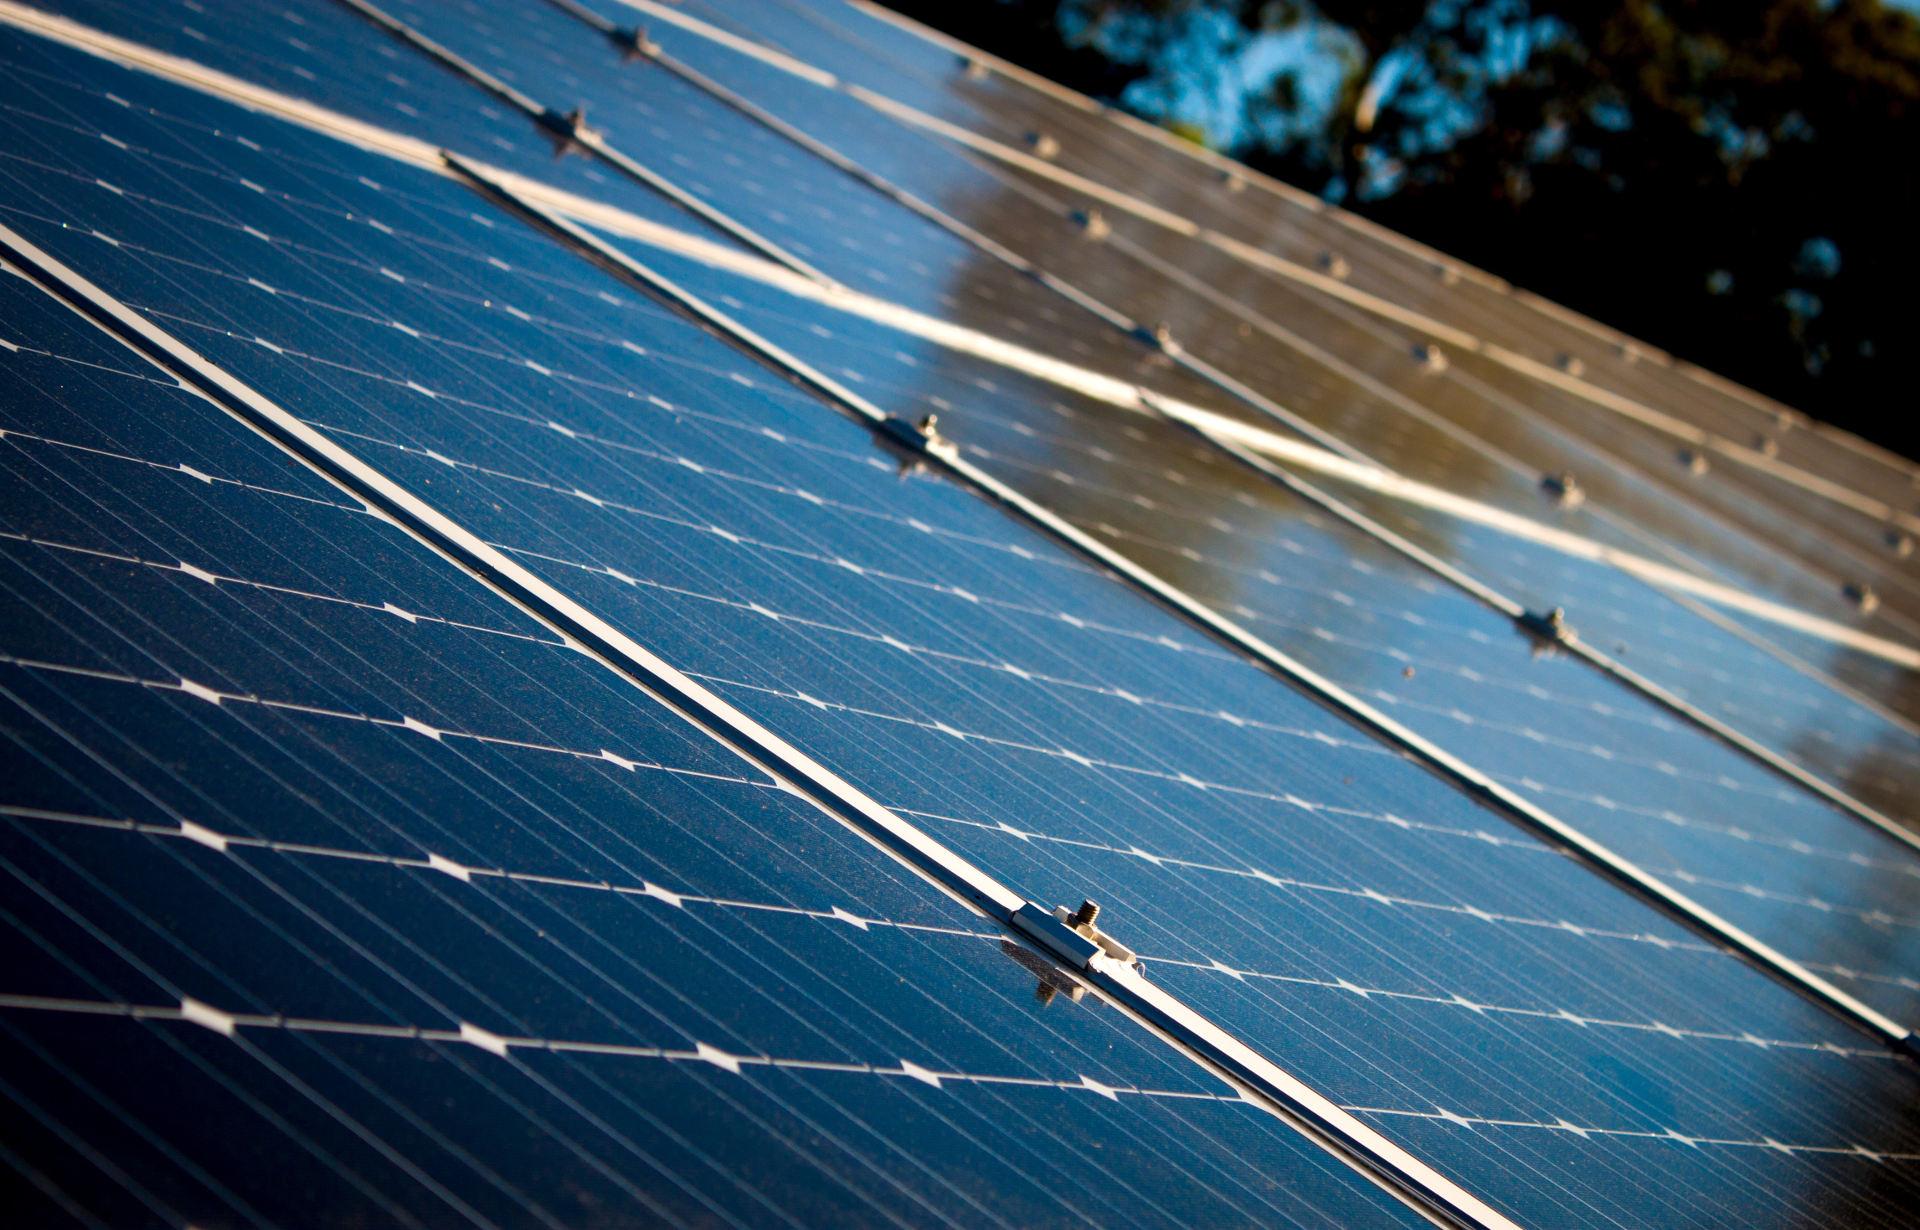 Aura Impianti - Elettrici Idraulici e Fotovoltaici a Rimini e provincia